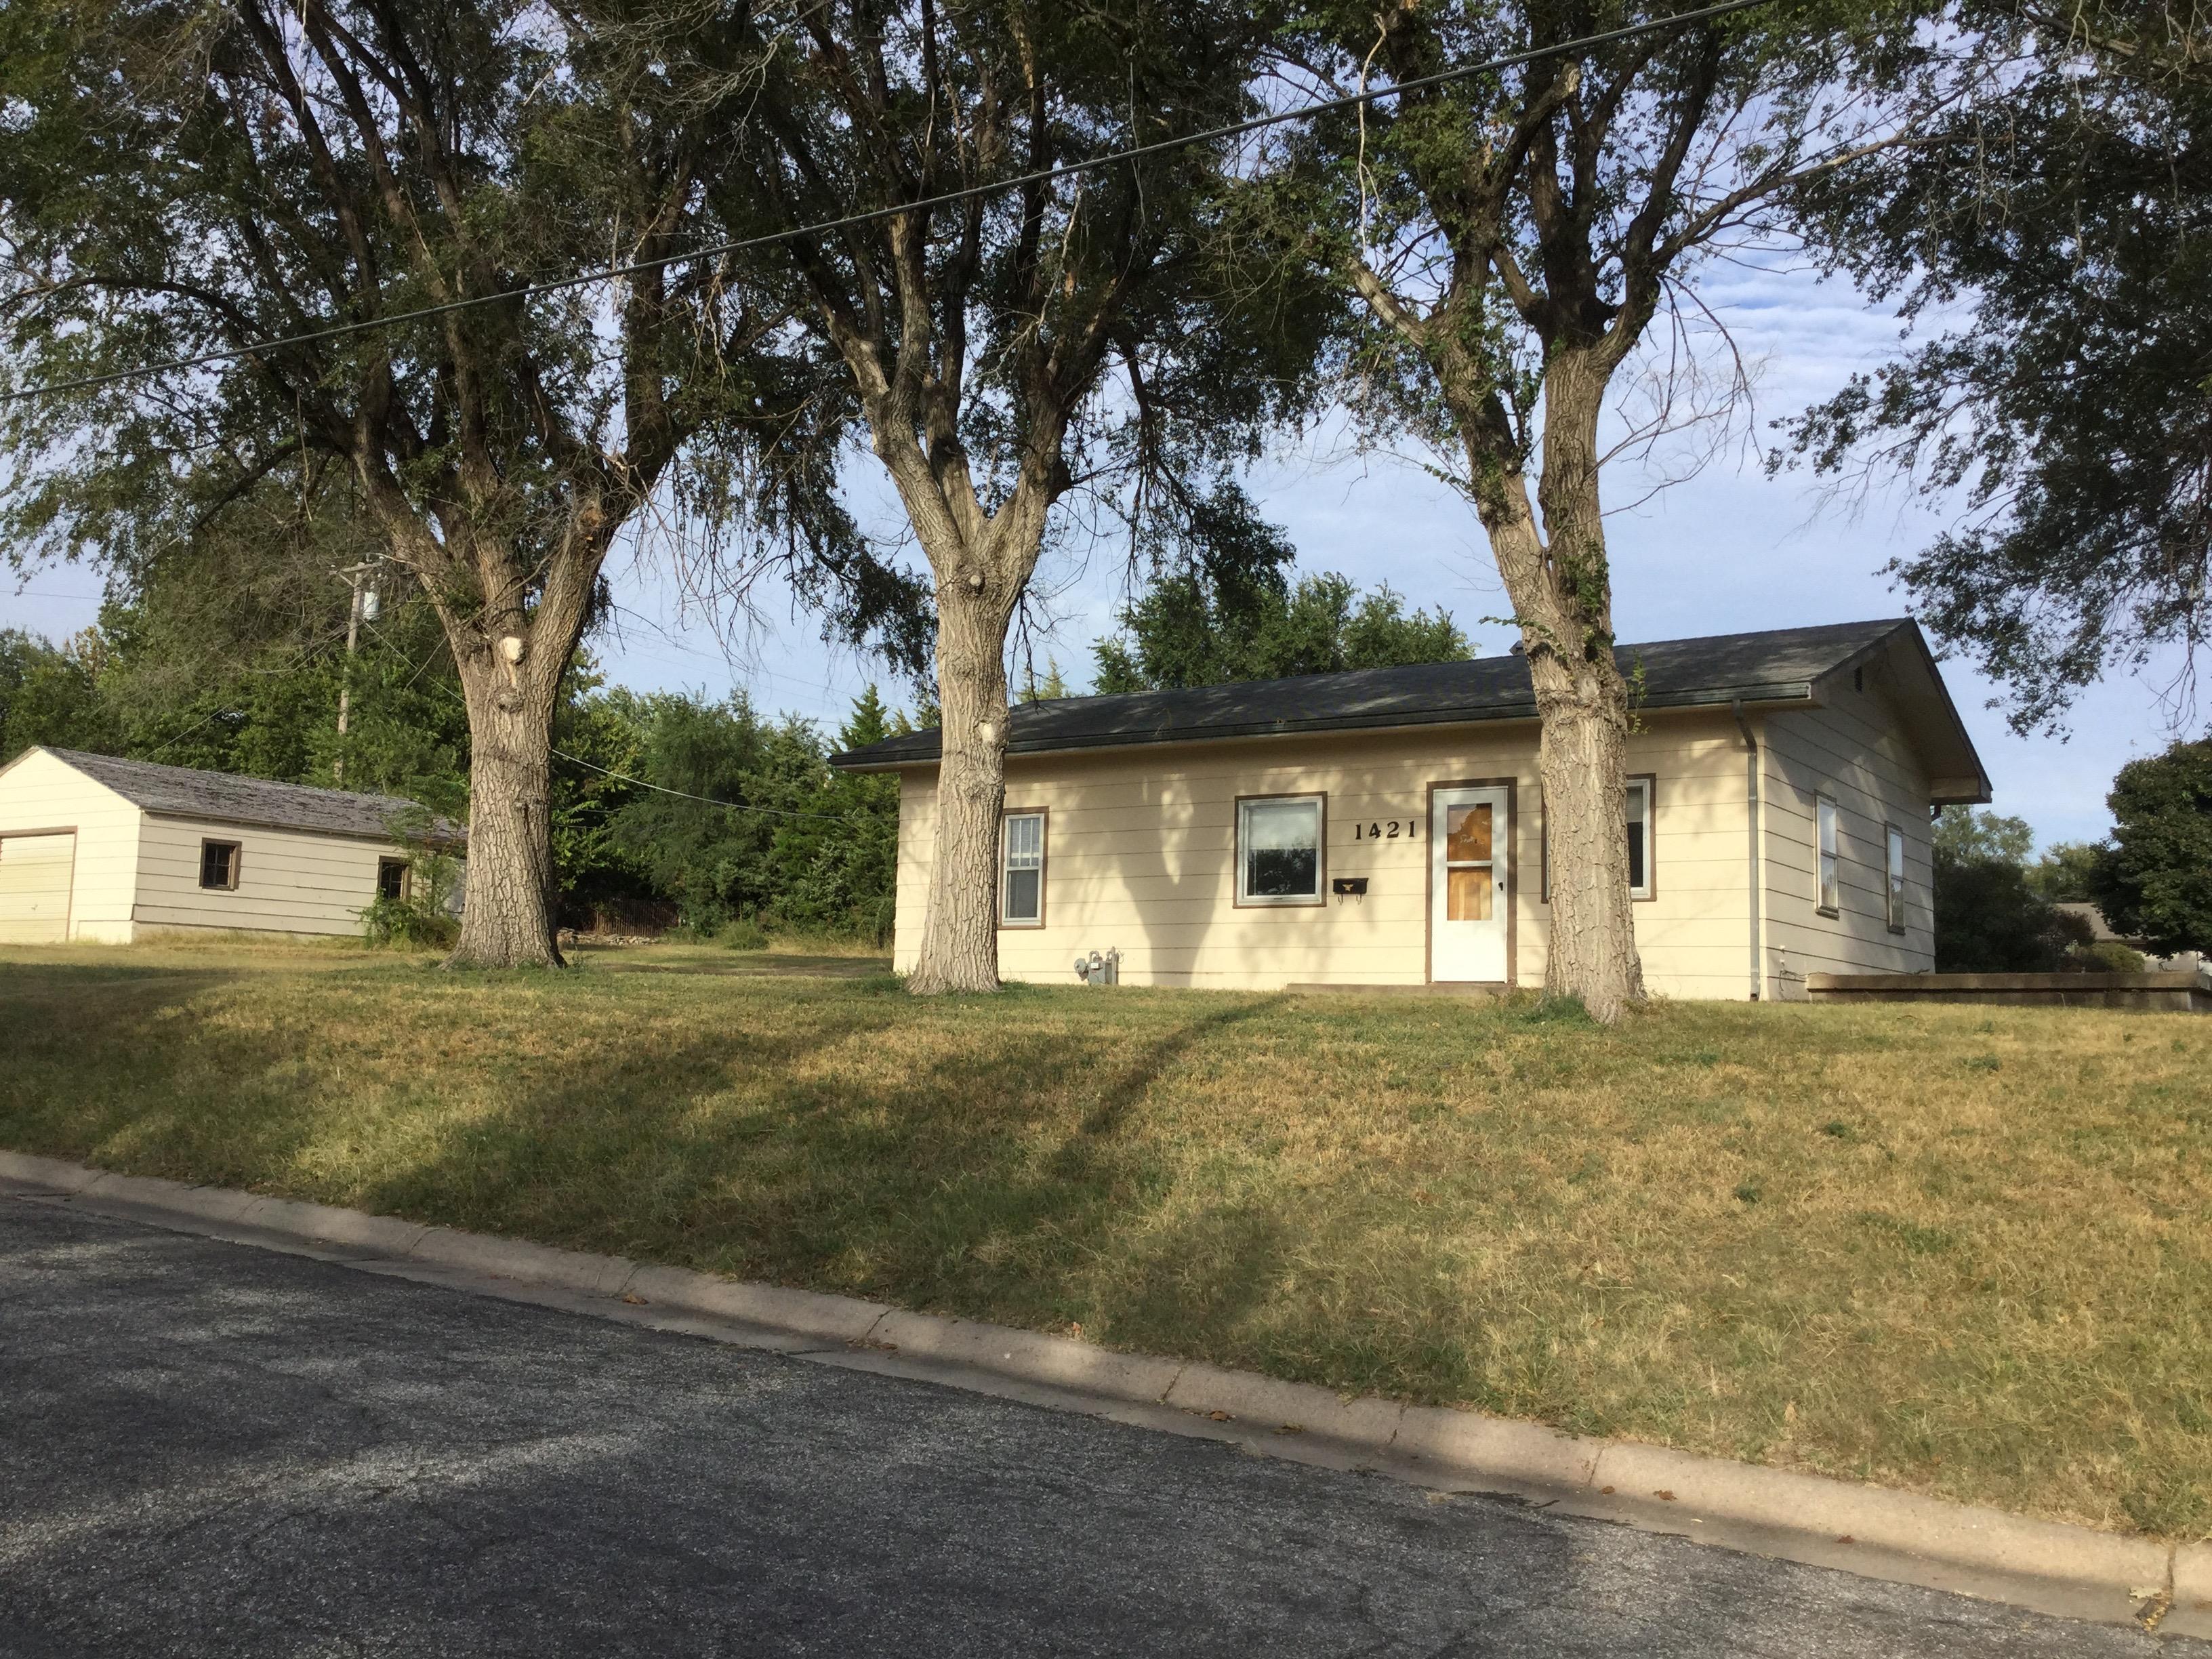 1421 Kansas, Concordia, Kansas 66901